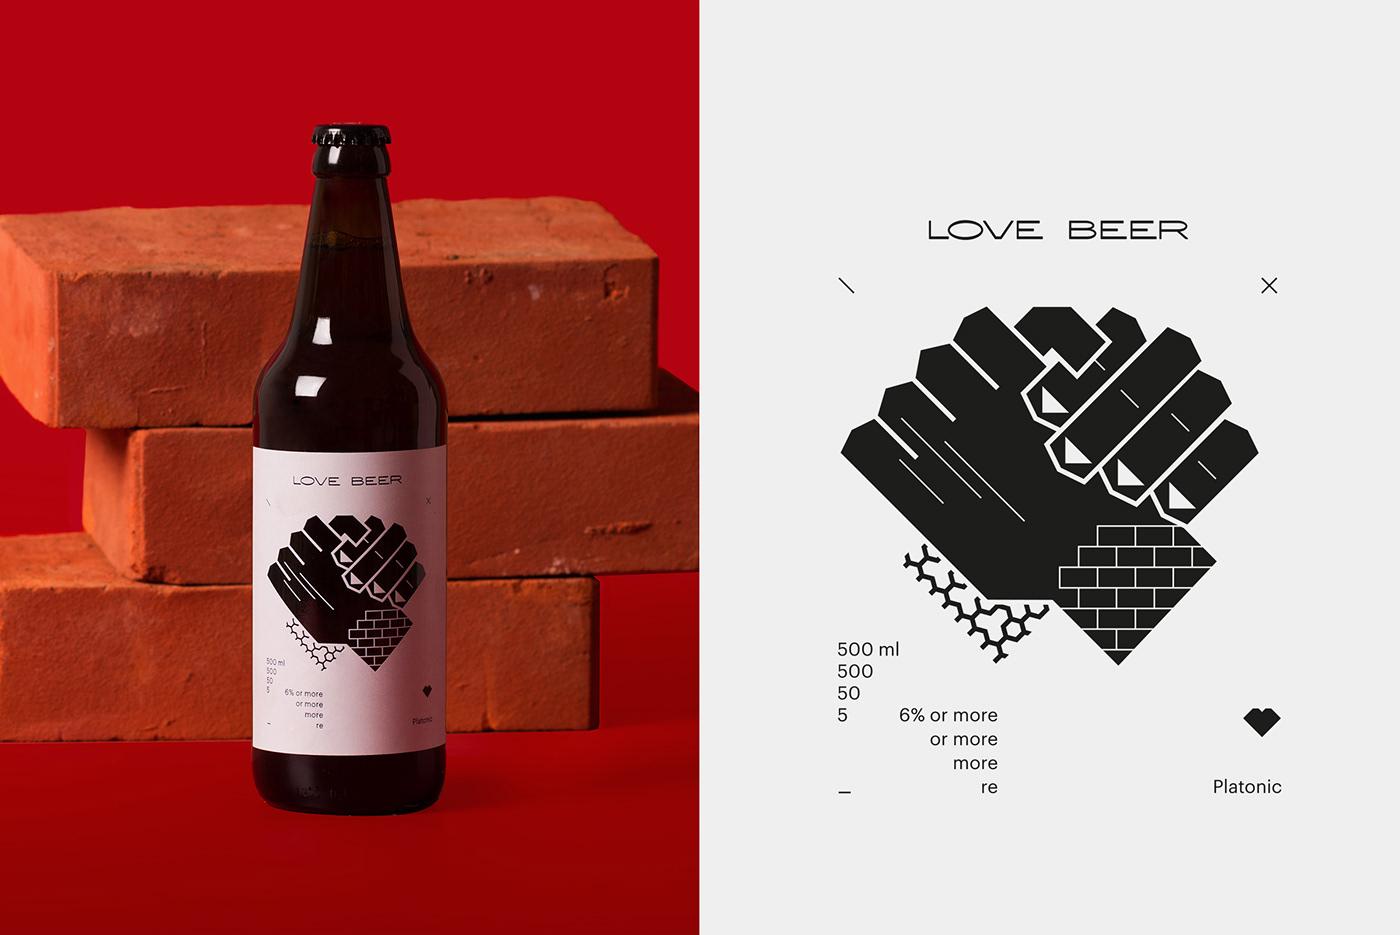 beer Love Label brand heartbreak friendship kiss black and white Monochromatic bewerage